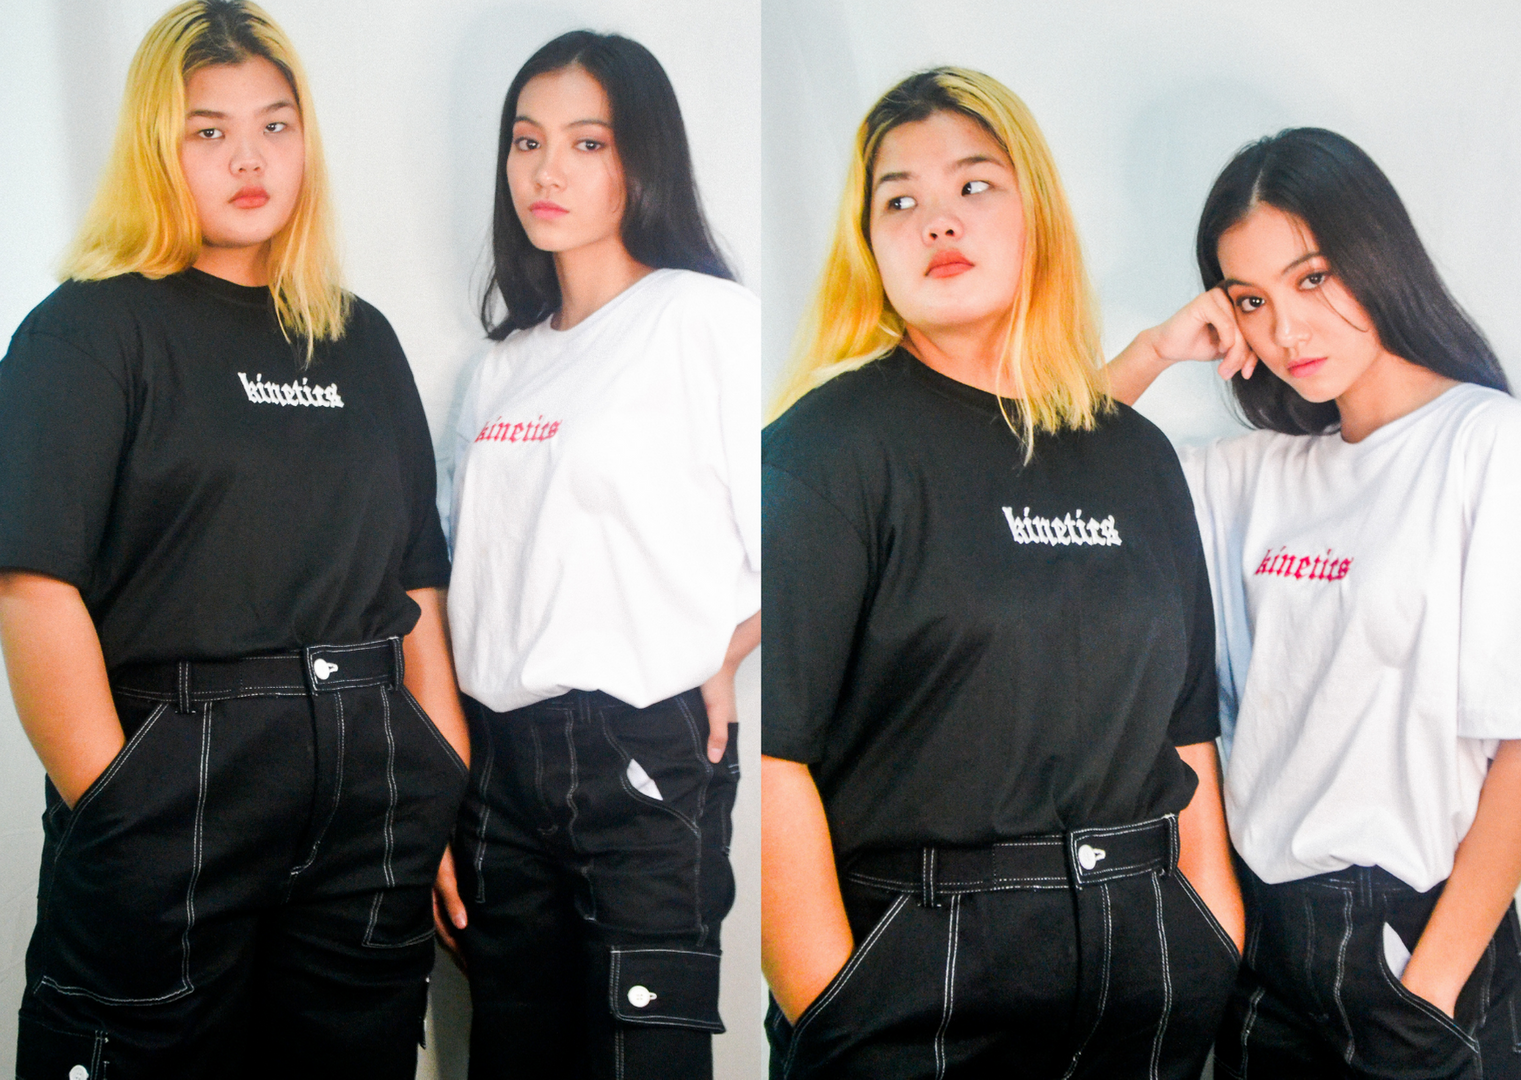 www.fashionkinetics.com